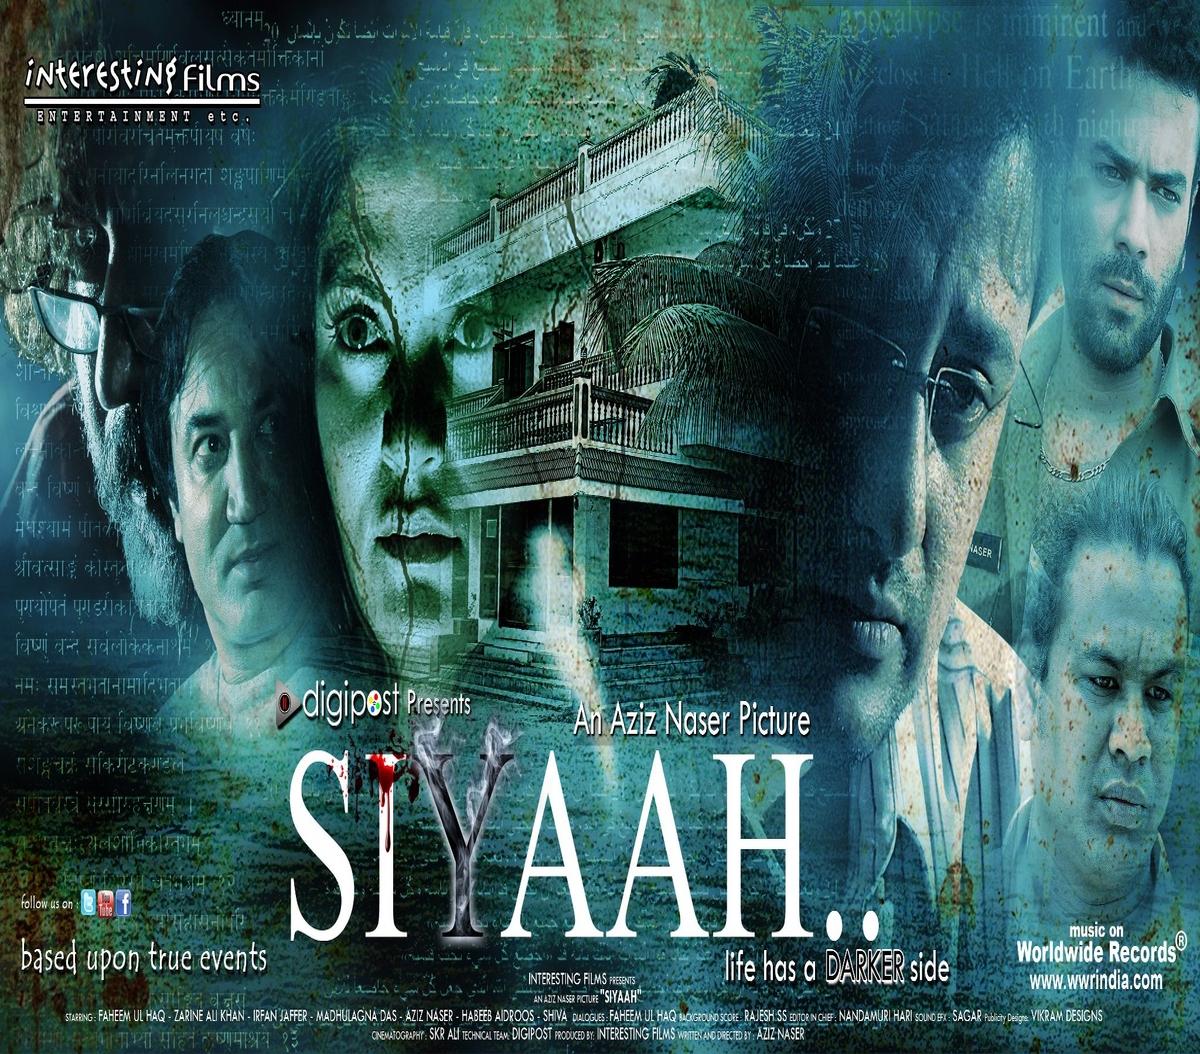 Siyaah.. - Movie Poster #5 (Original)